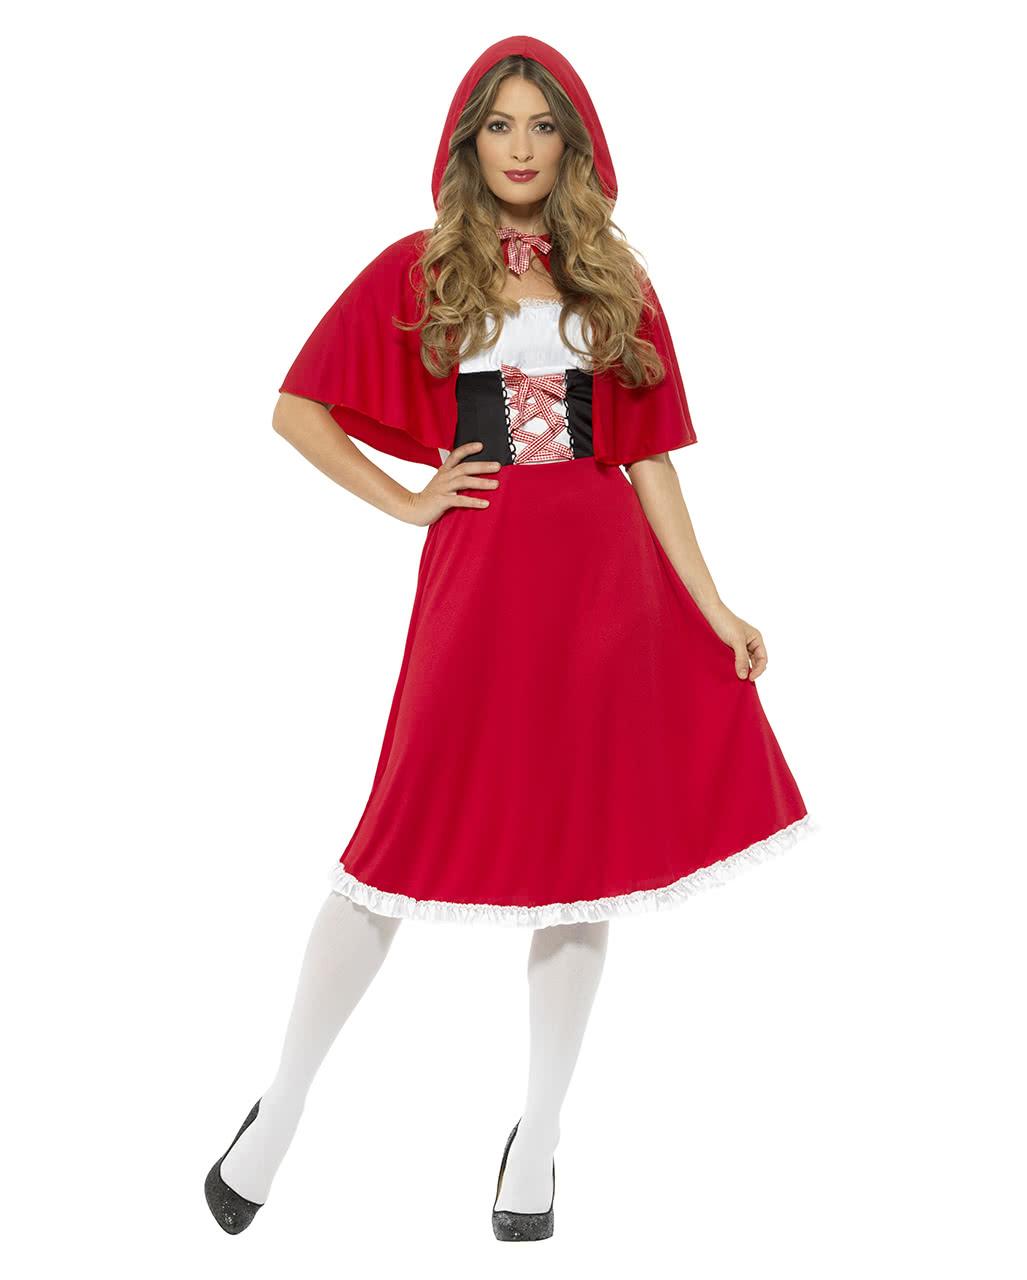 Rotkappchen Kostum Mit Kapuze Fur Karneval Horror Shop Com